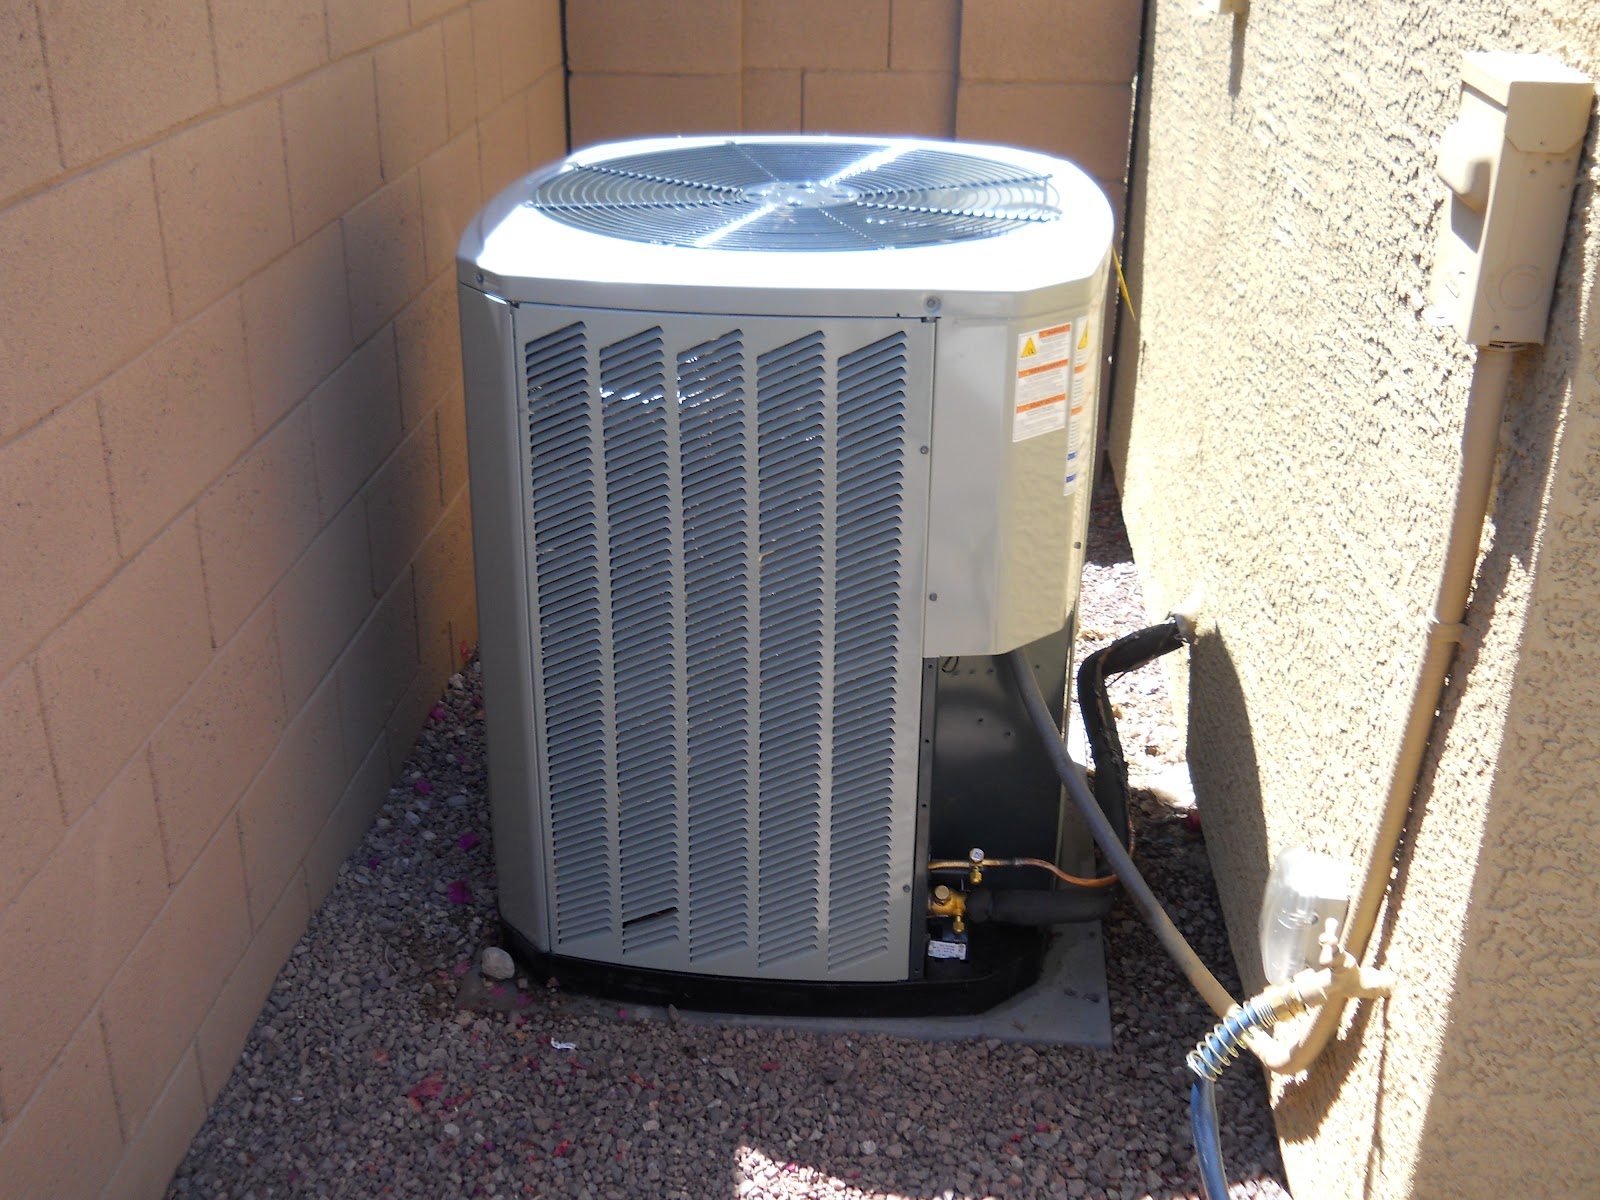 Trane Condenser Fan Motor Replacement